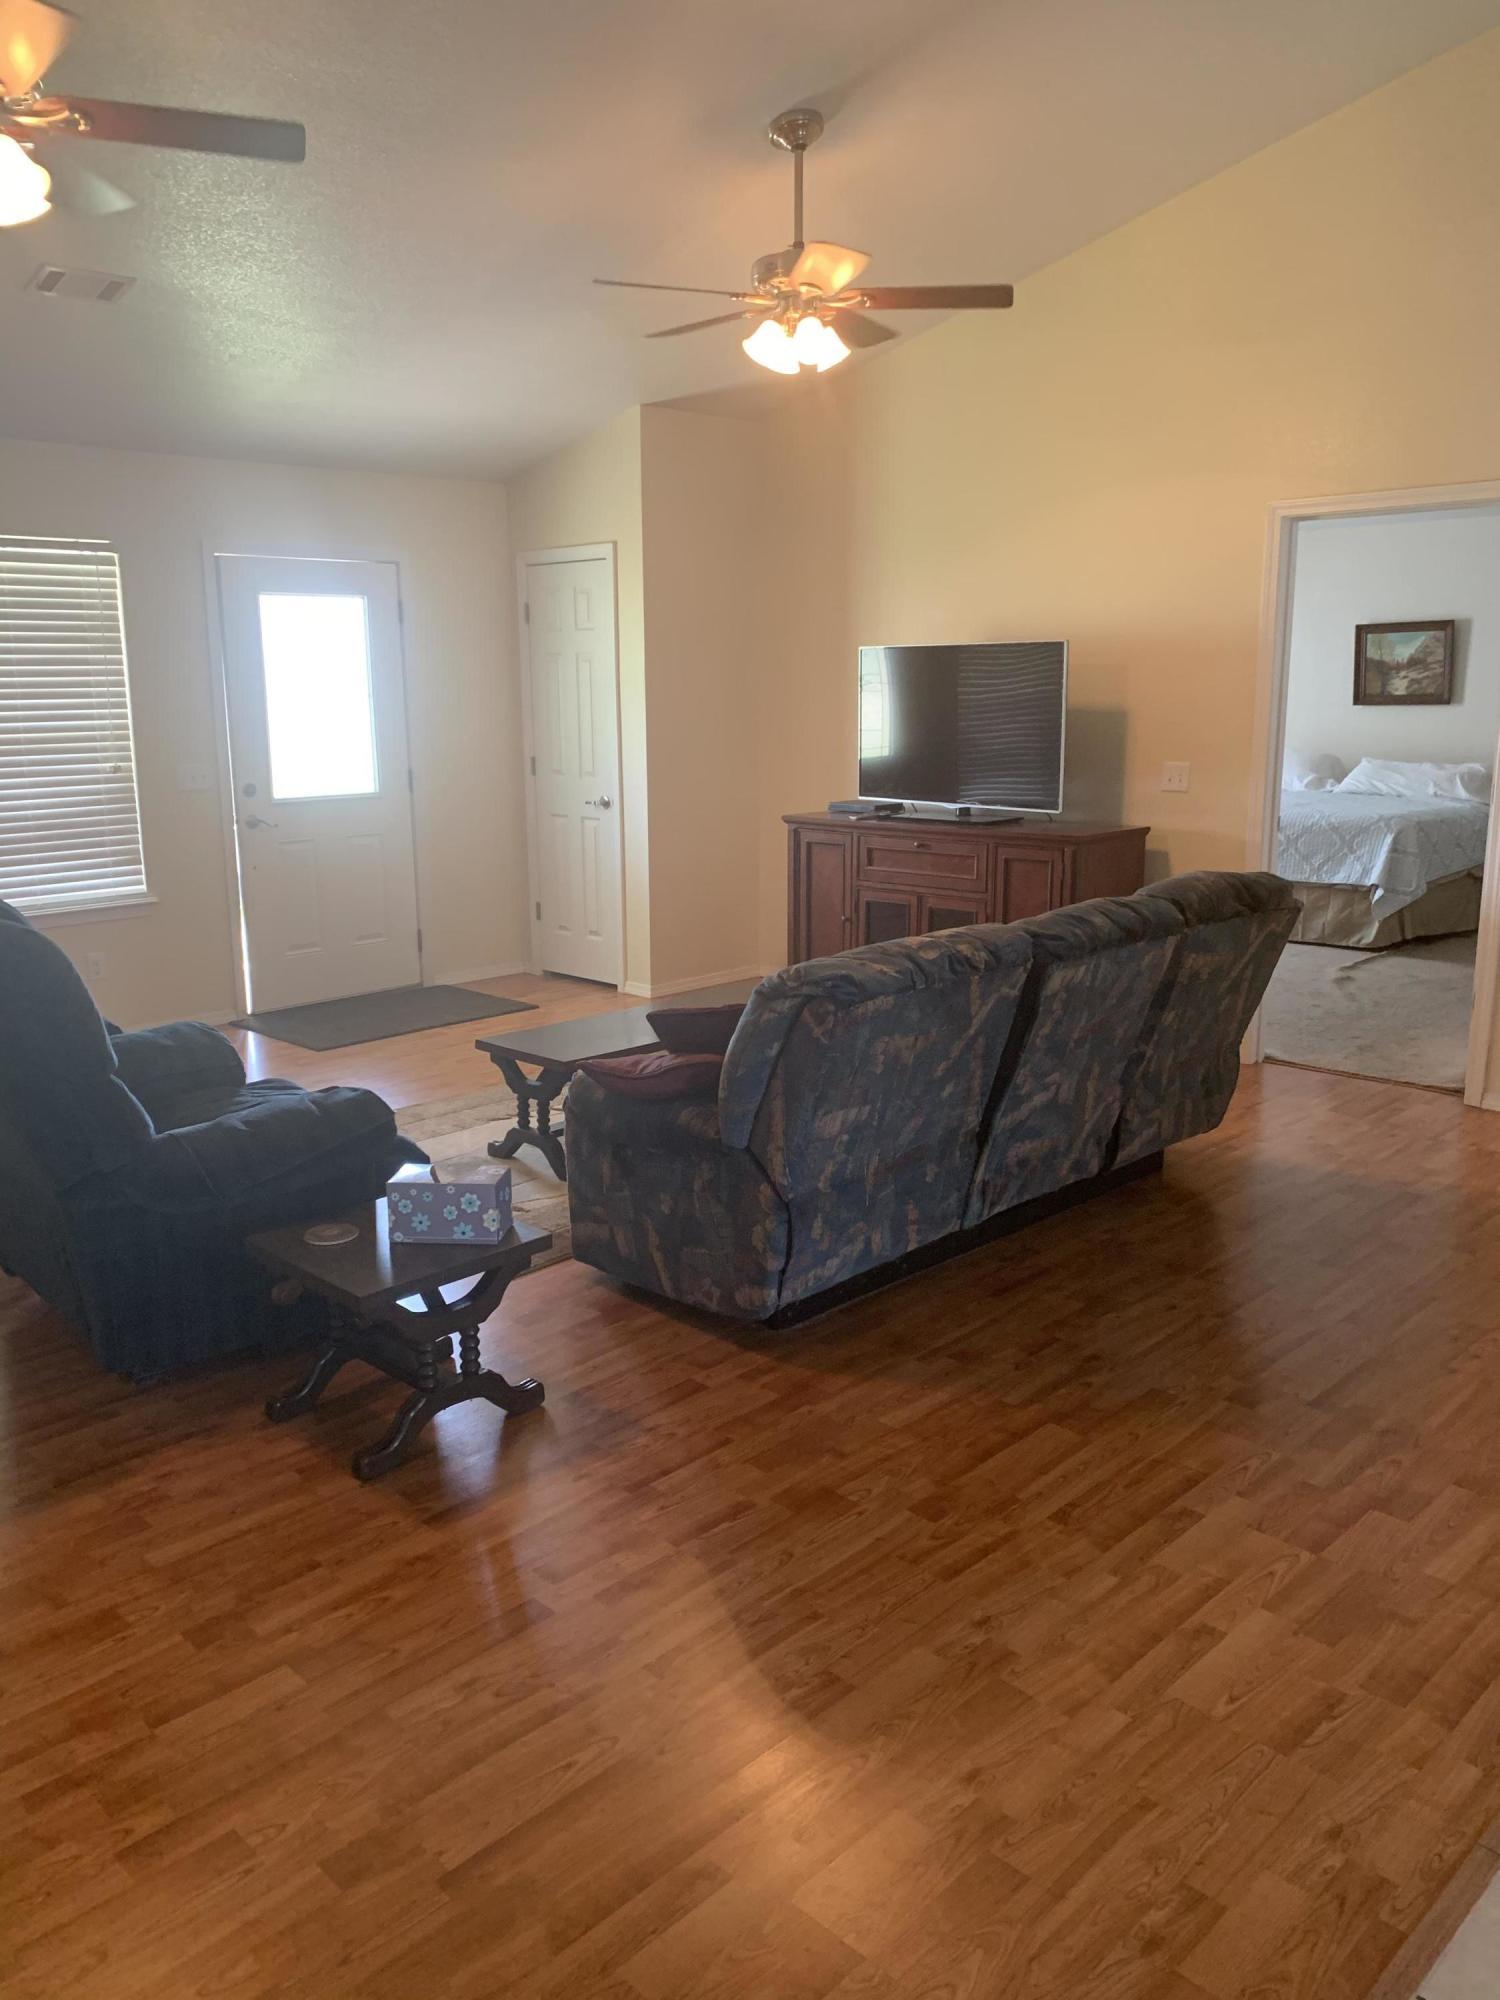 Large photo 3 of Lamar home for sale at 124 Cedarwood Drive, Lamar, AR